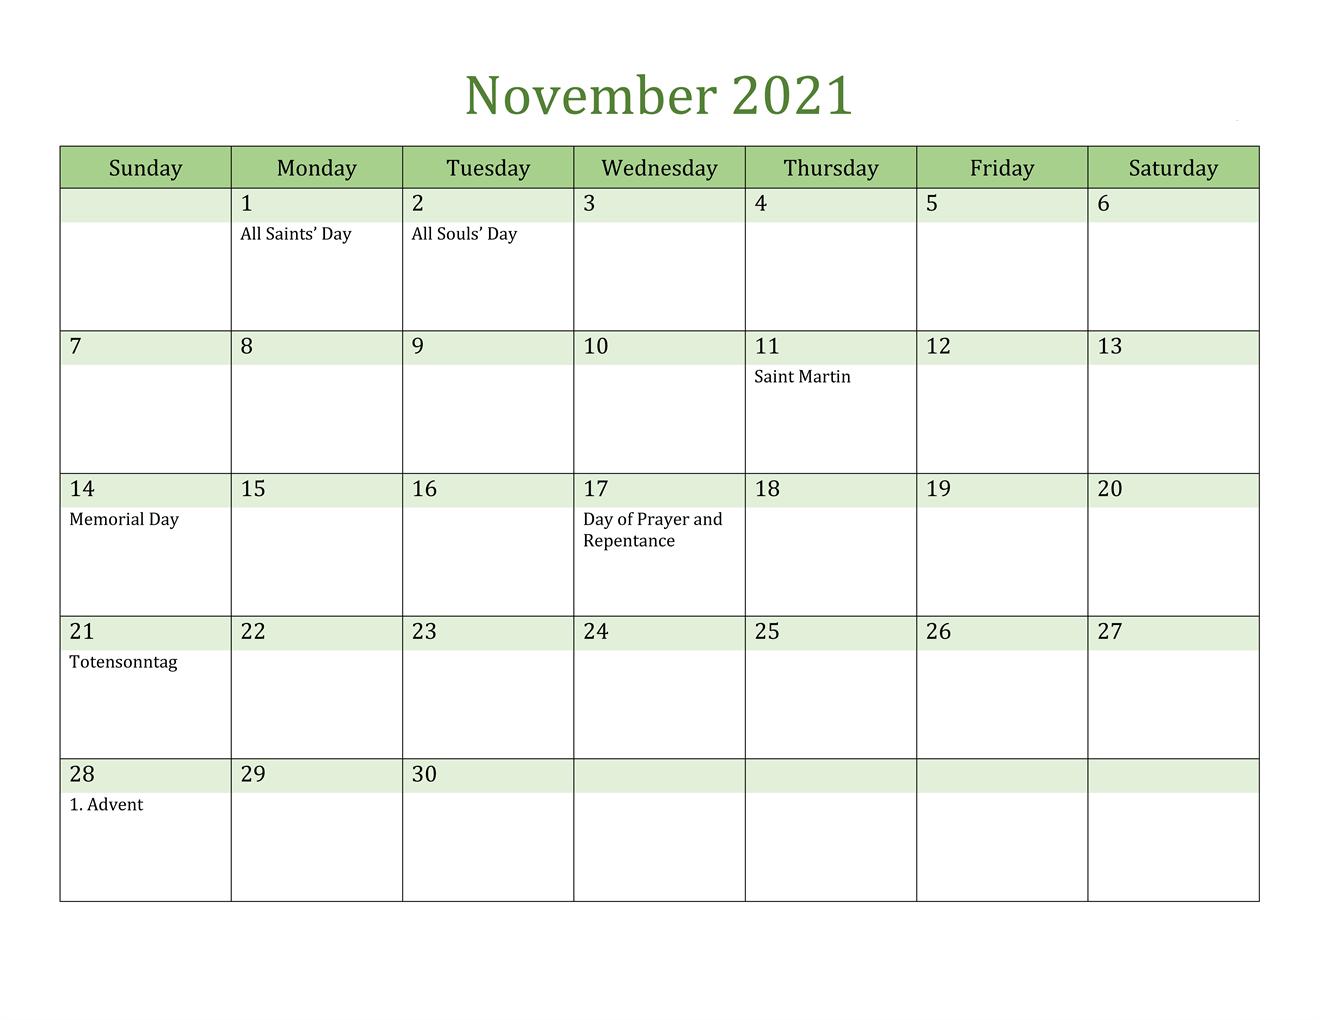 November 2021 Blank Calendar Excel Template